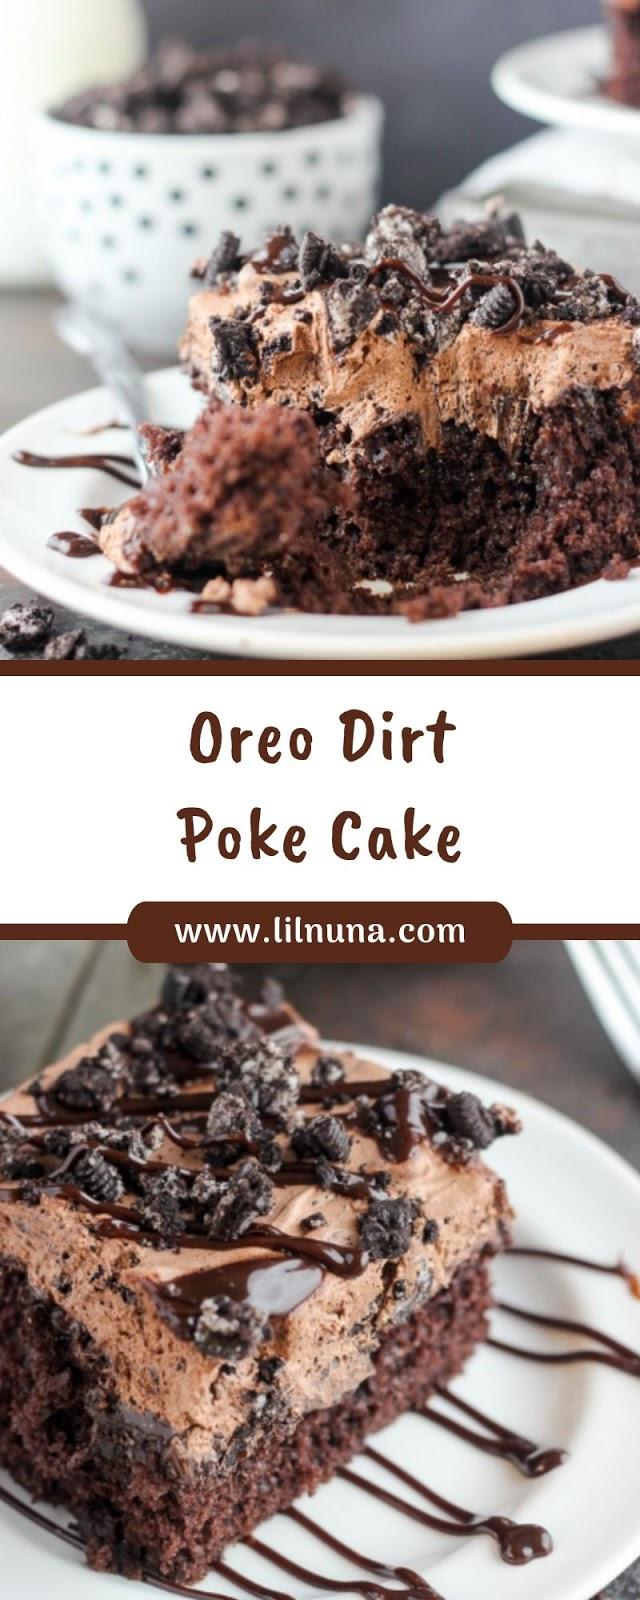 Oreo Dirt Poke Cake